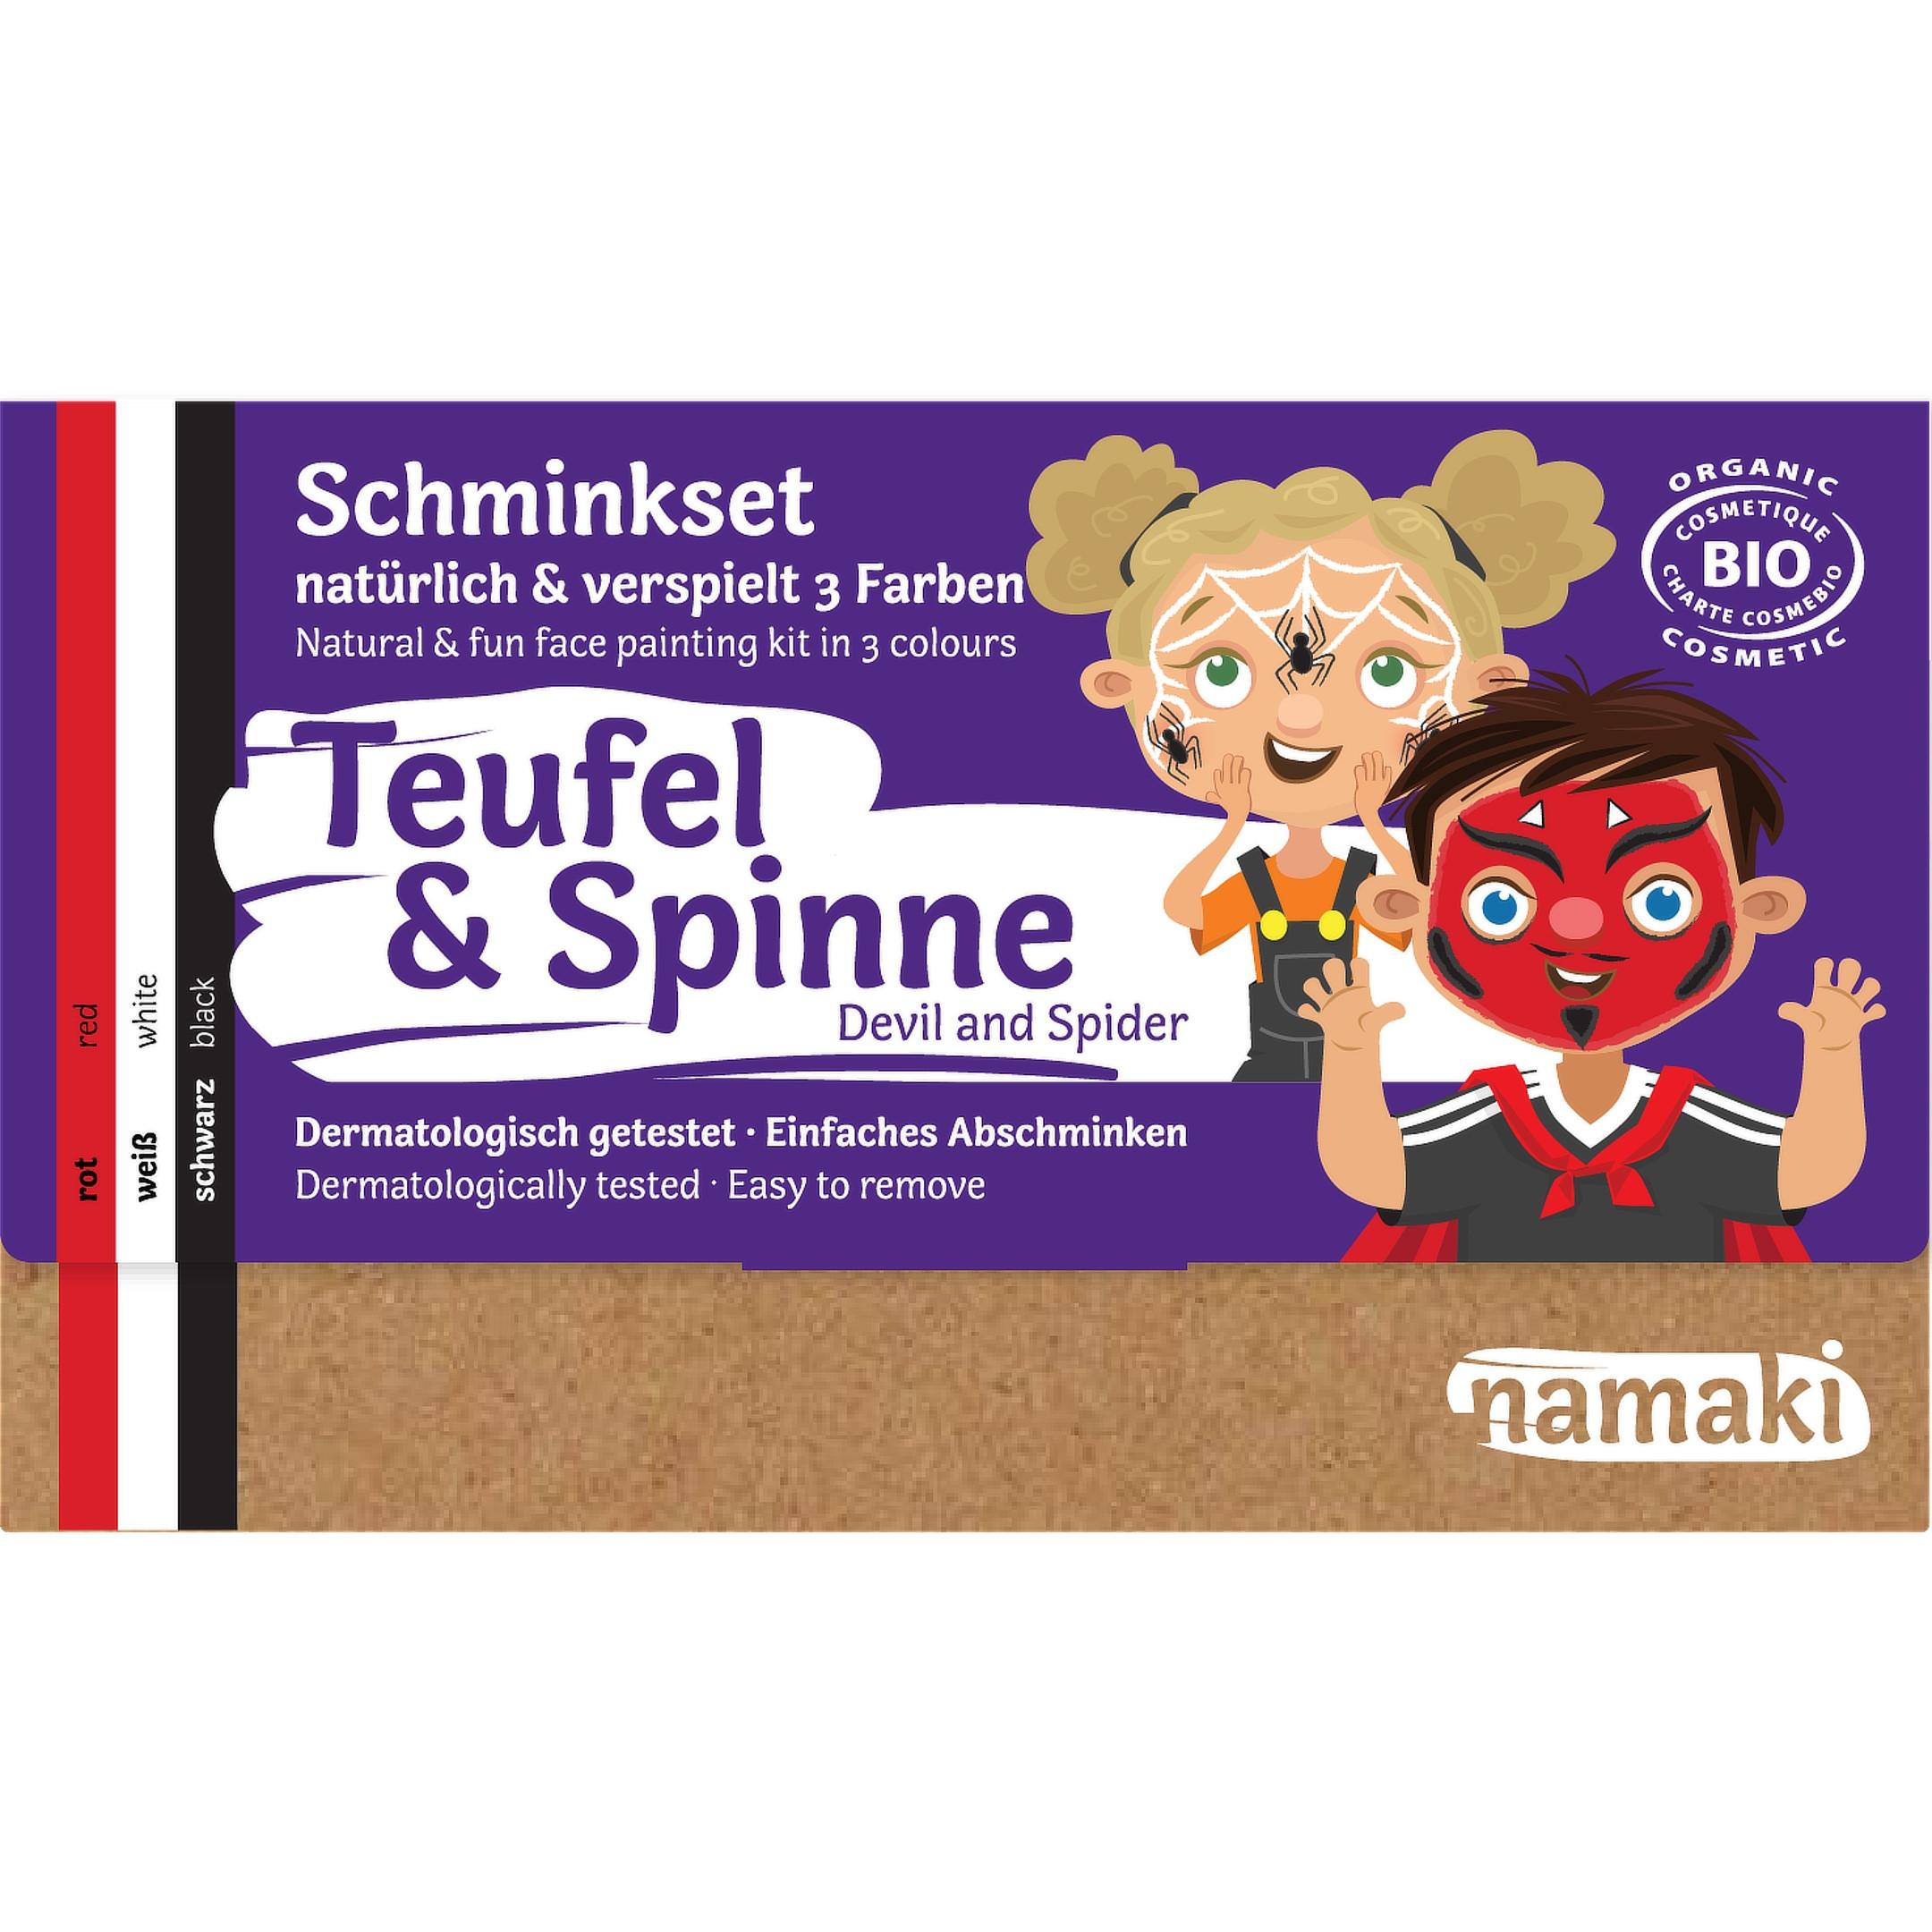 Namaki Teufel & Spinne Schminkset